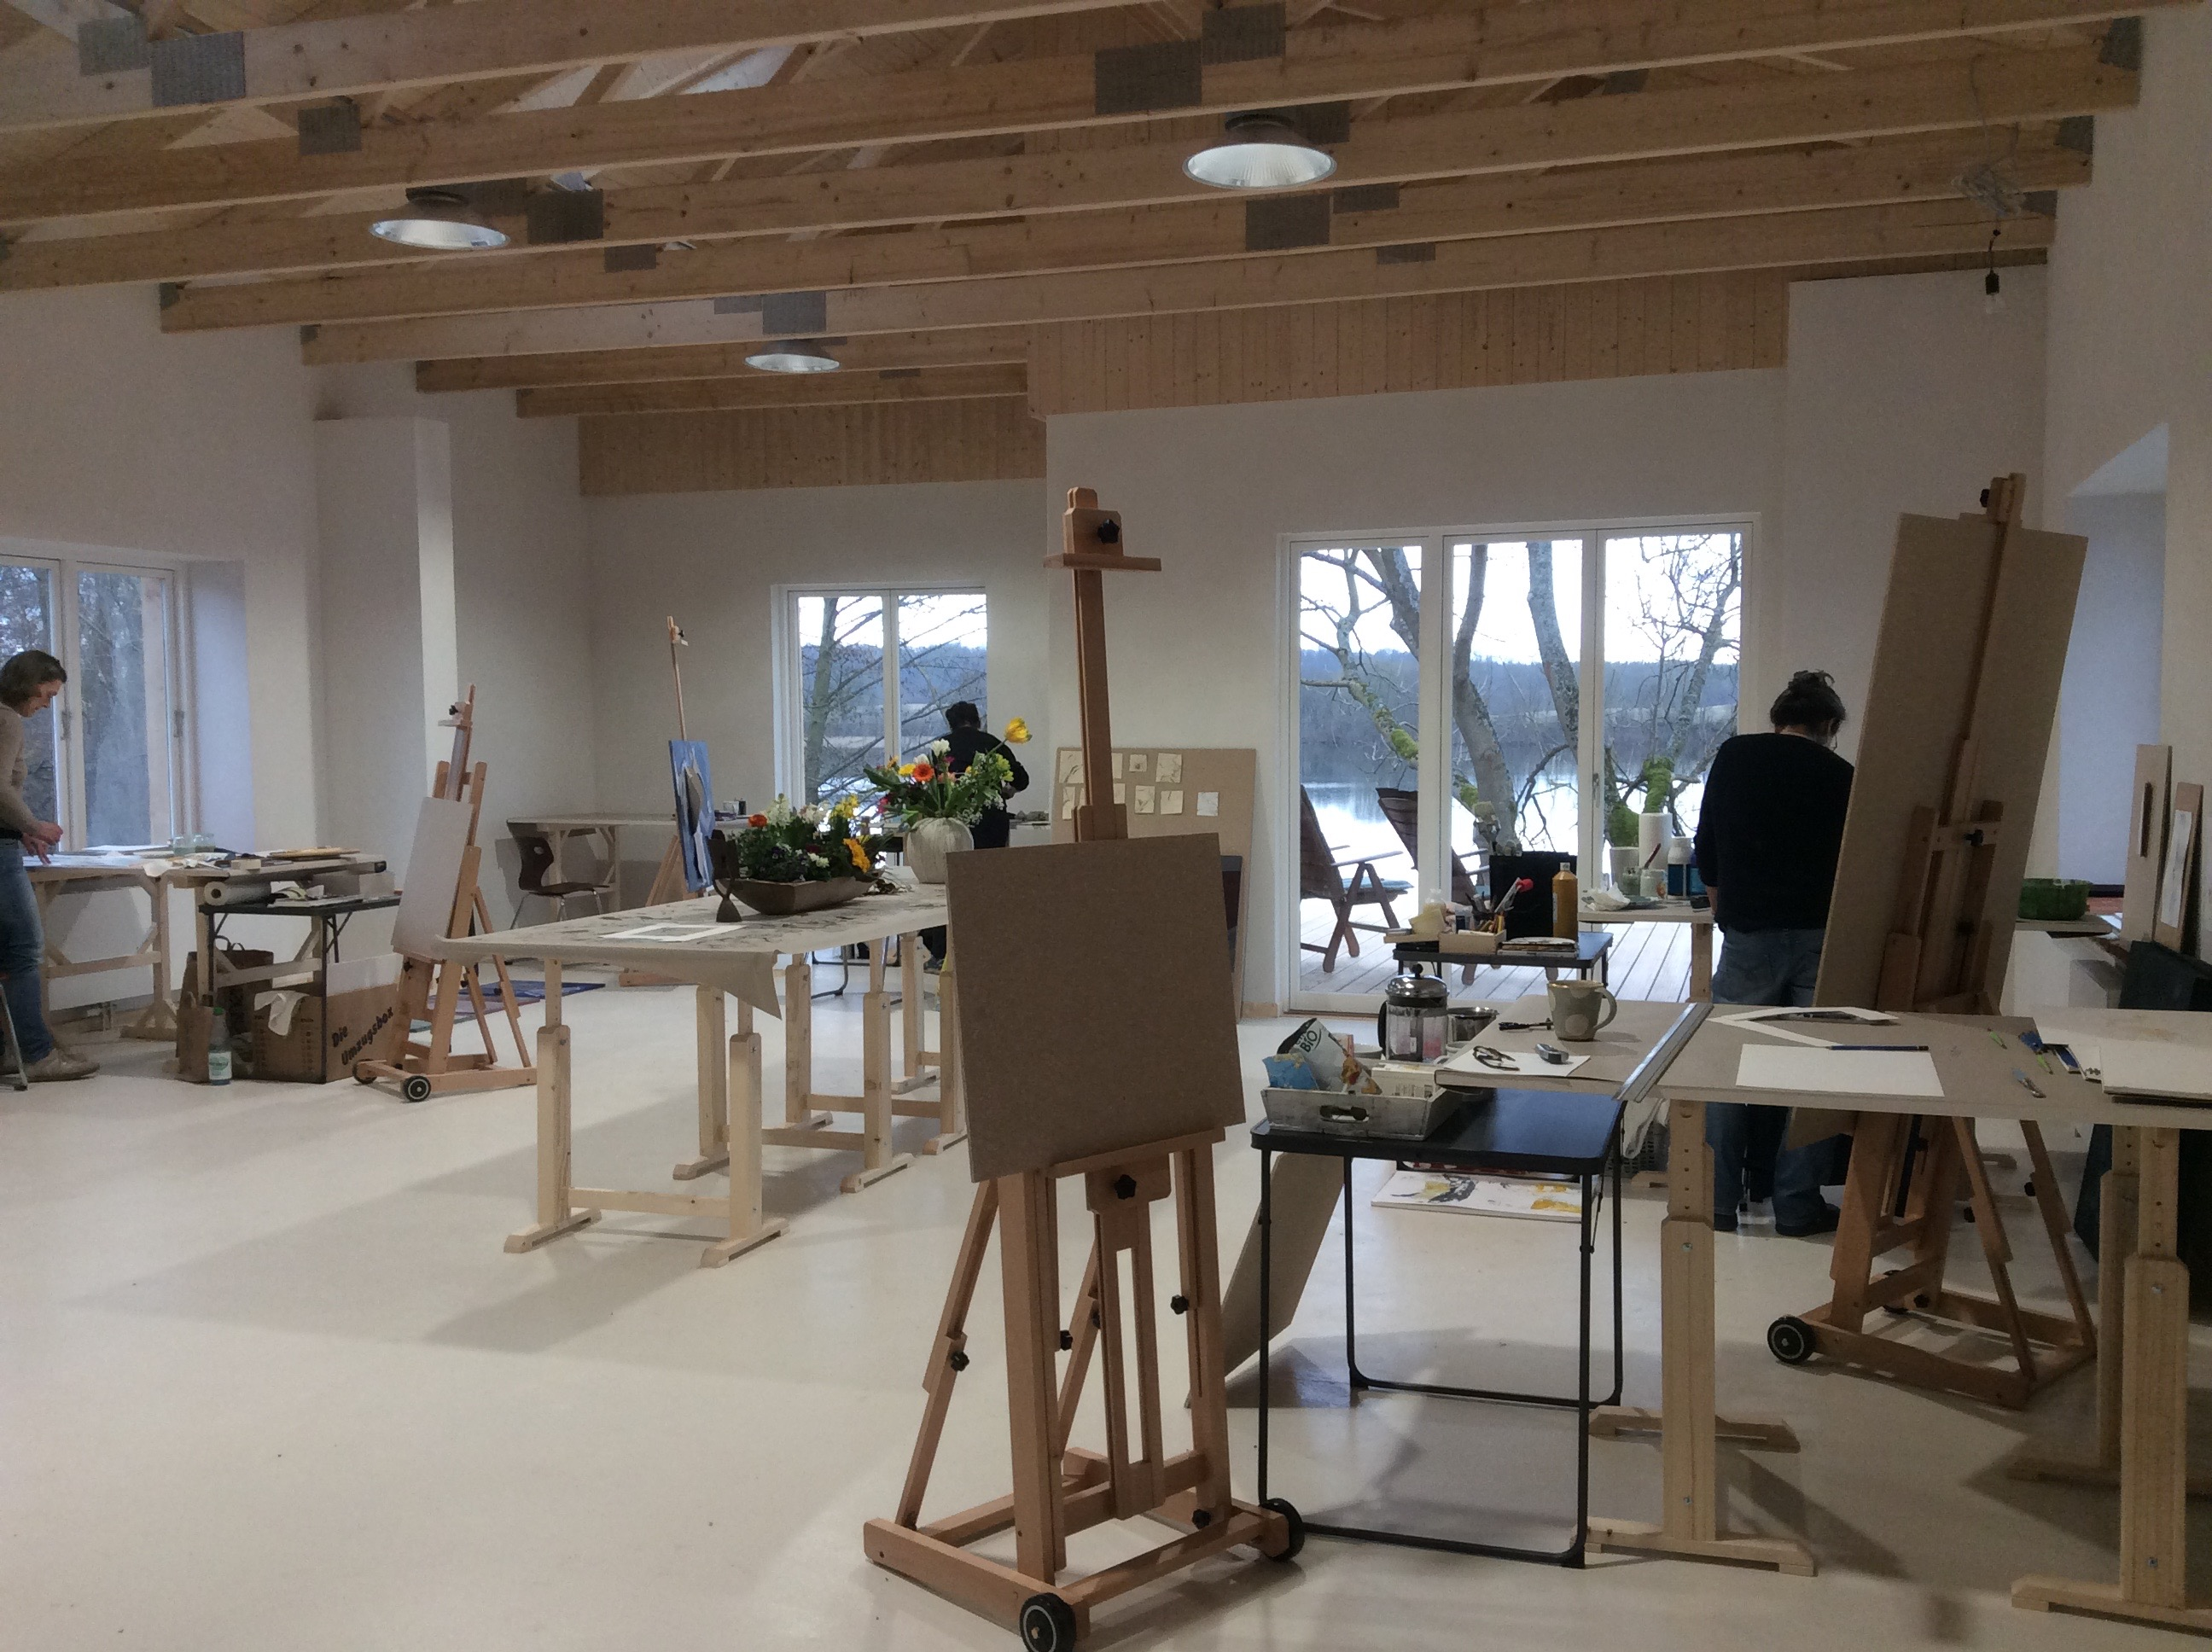 Atelier im Anbau